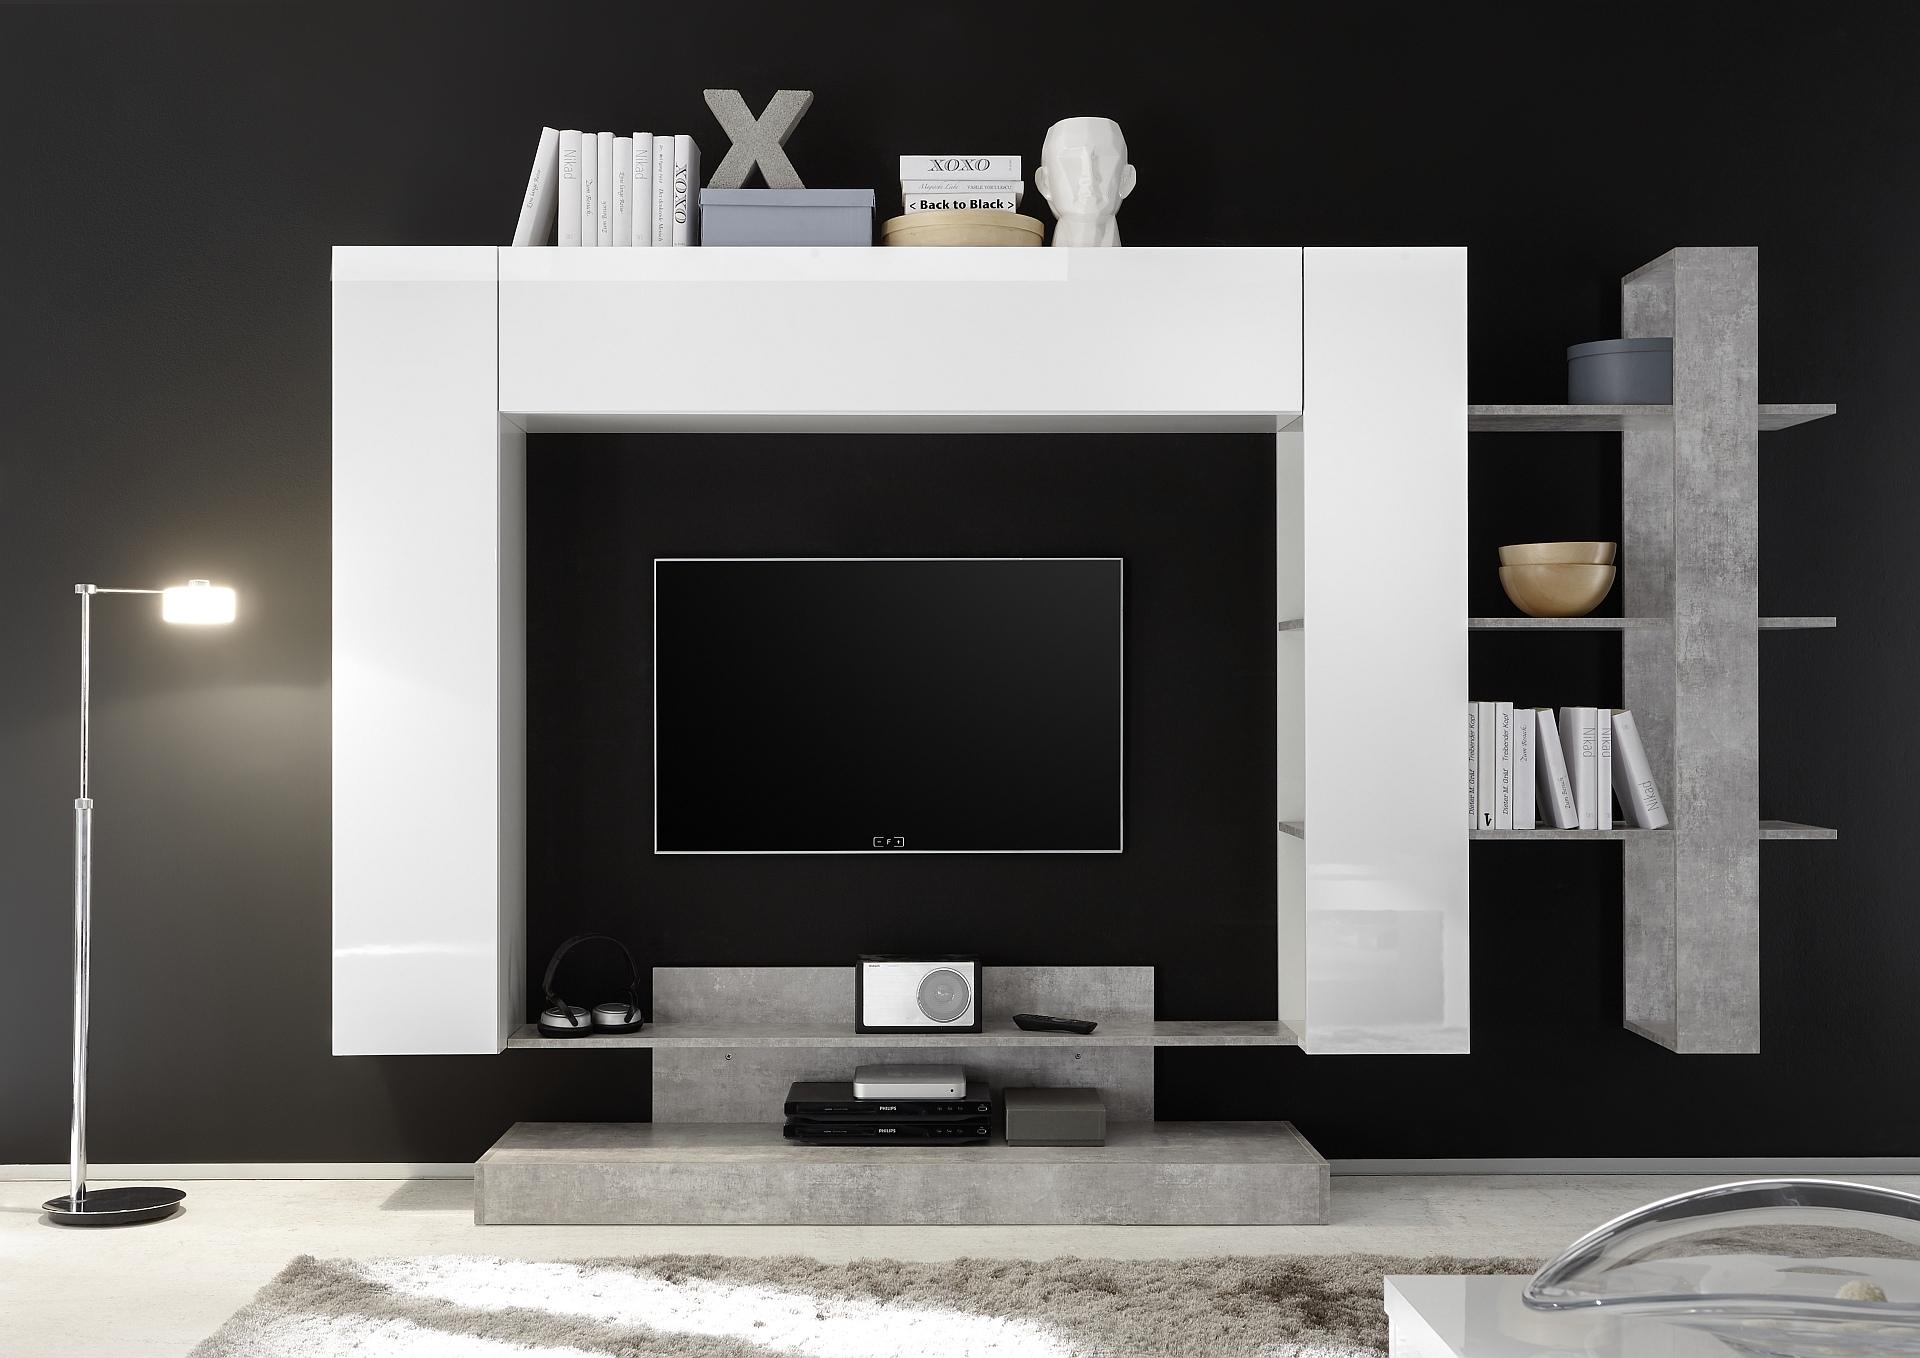 Tv-wandmeubel Jason 259 cm breed in wit met grijs beton